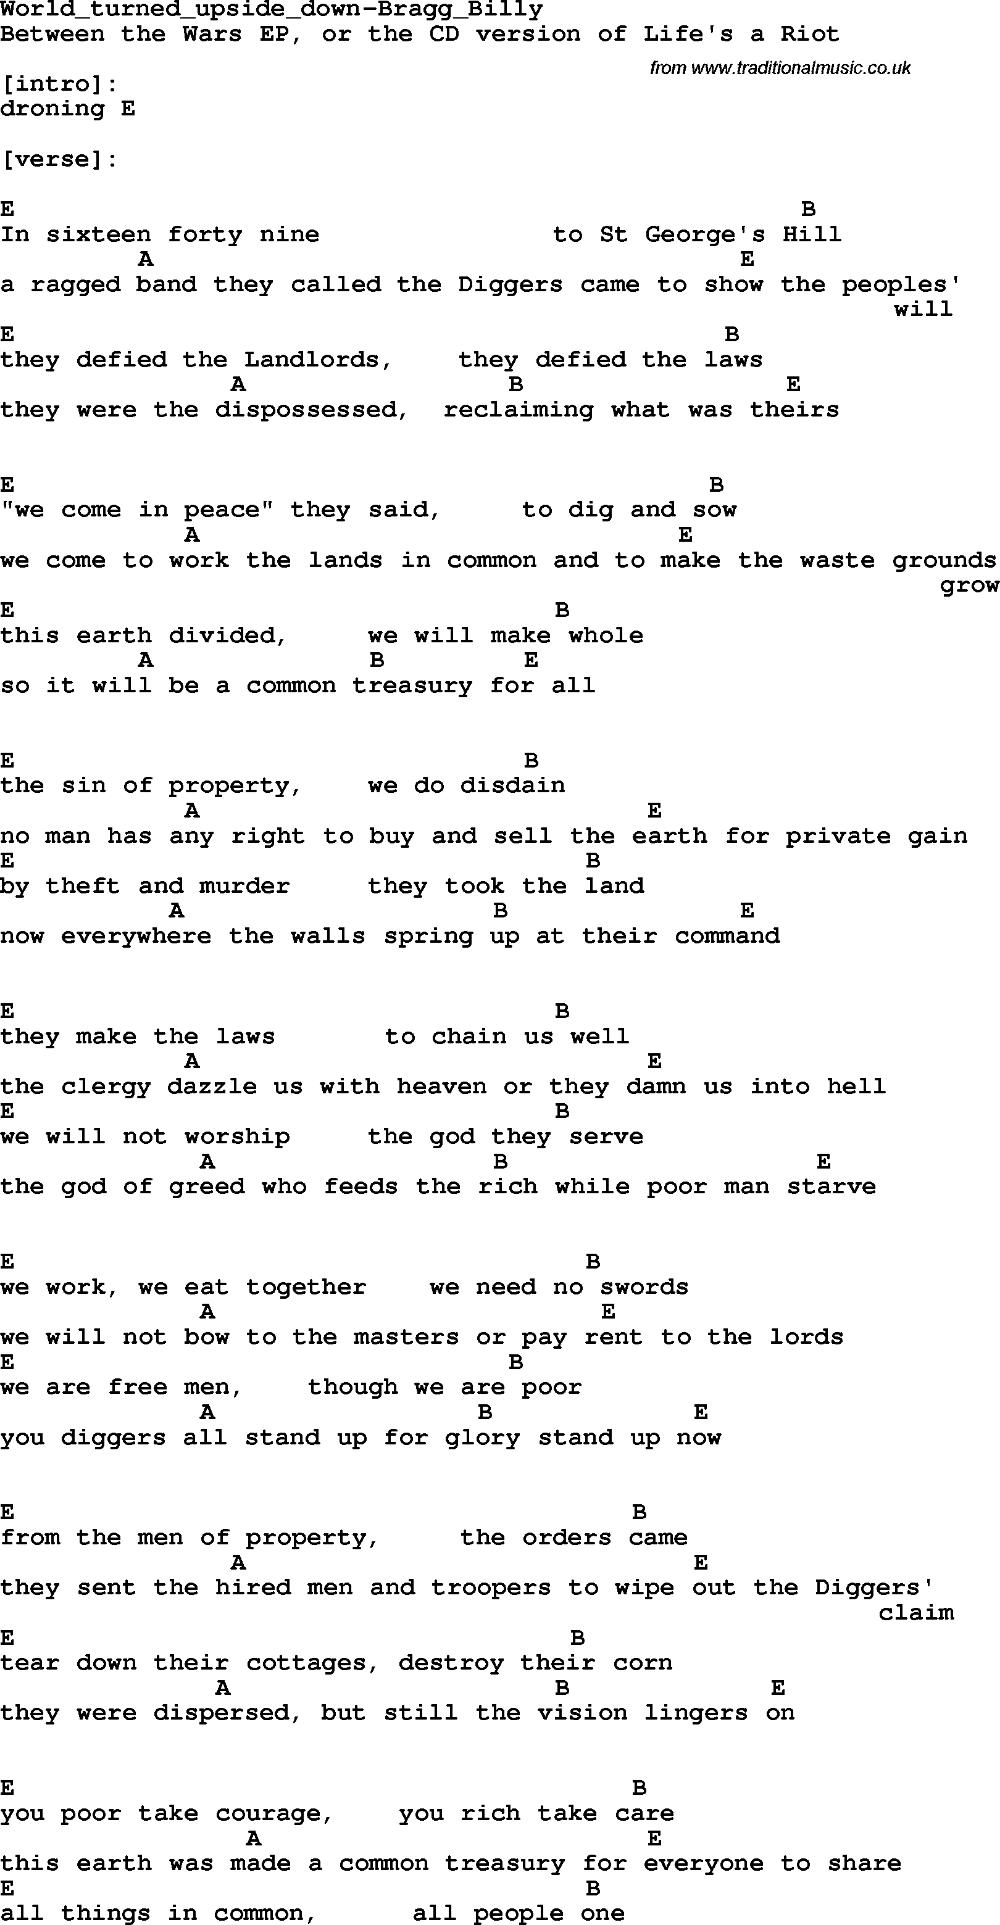 Upside down lyrics   Google Search